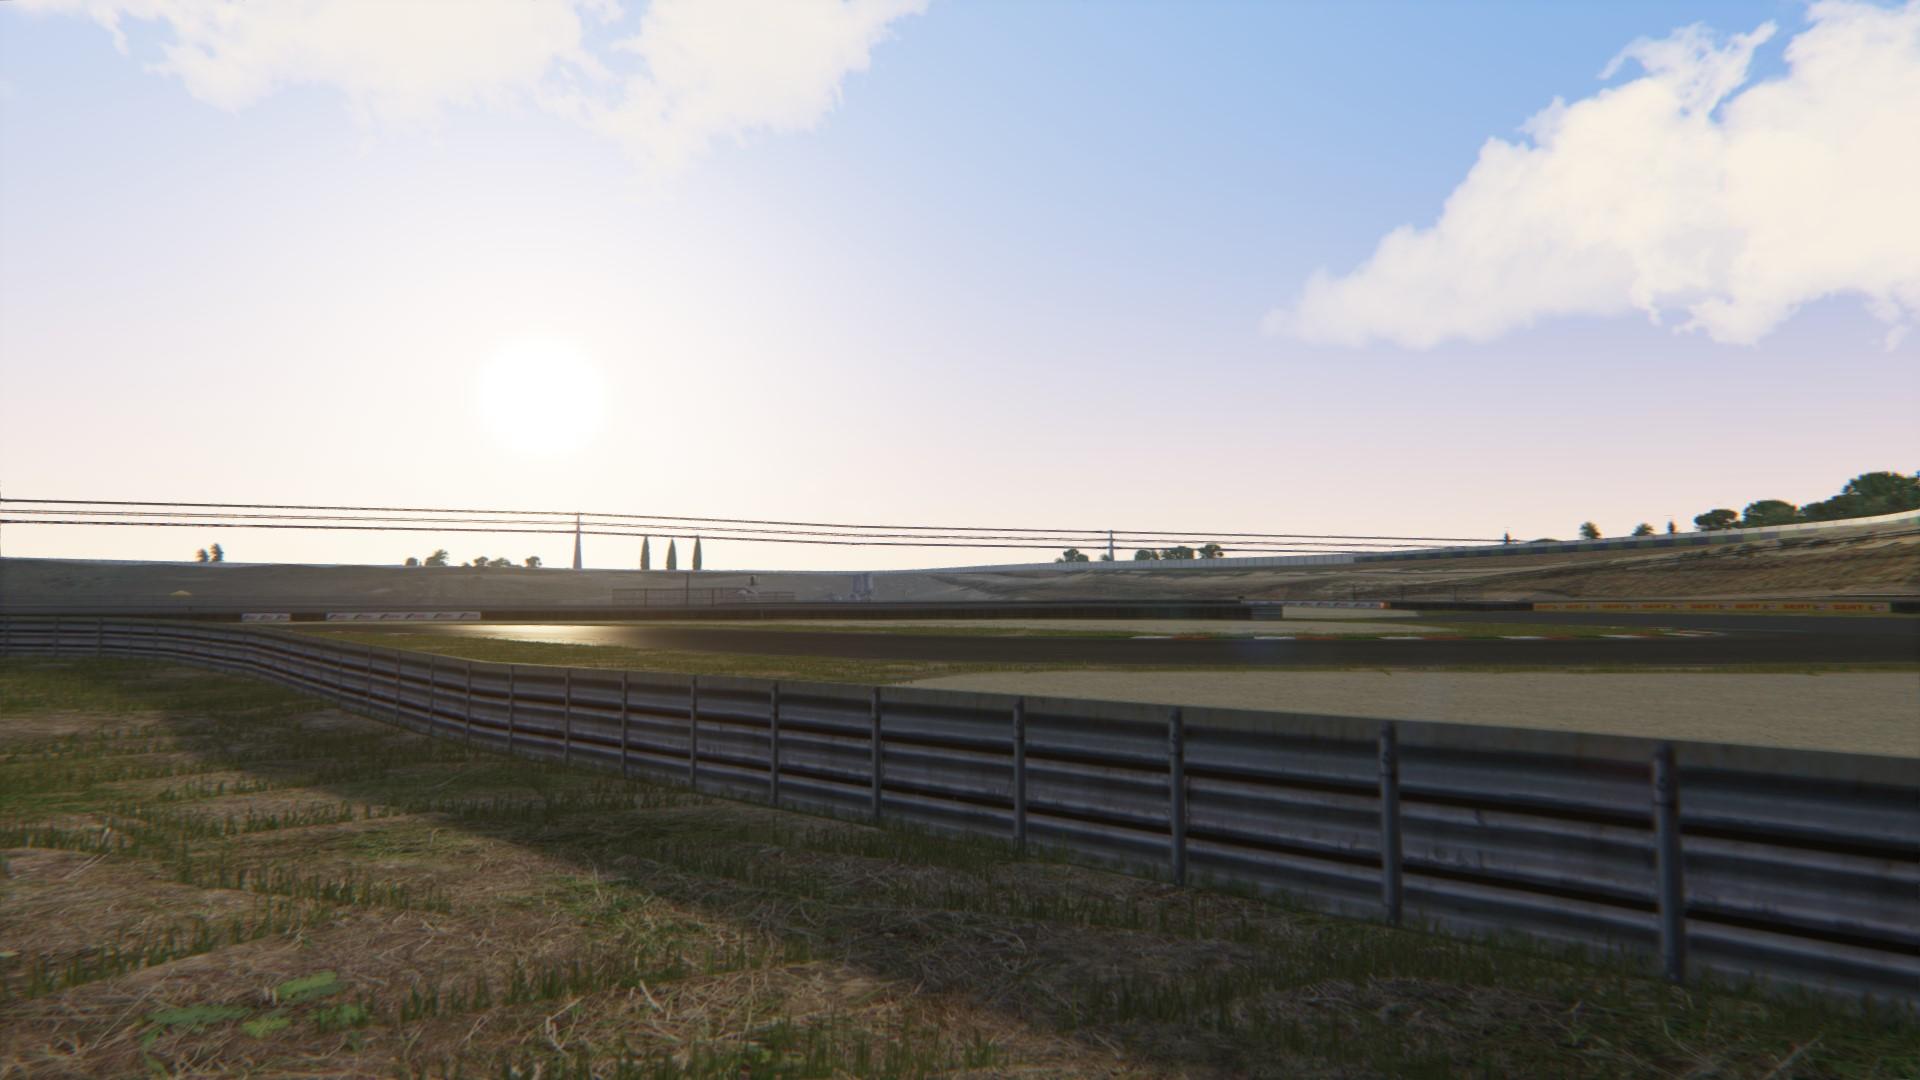 Screenshot_ks_toyota_ae86_autodromo_di_franciacorta_1-6-116-0-35-21.jpg